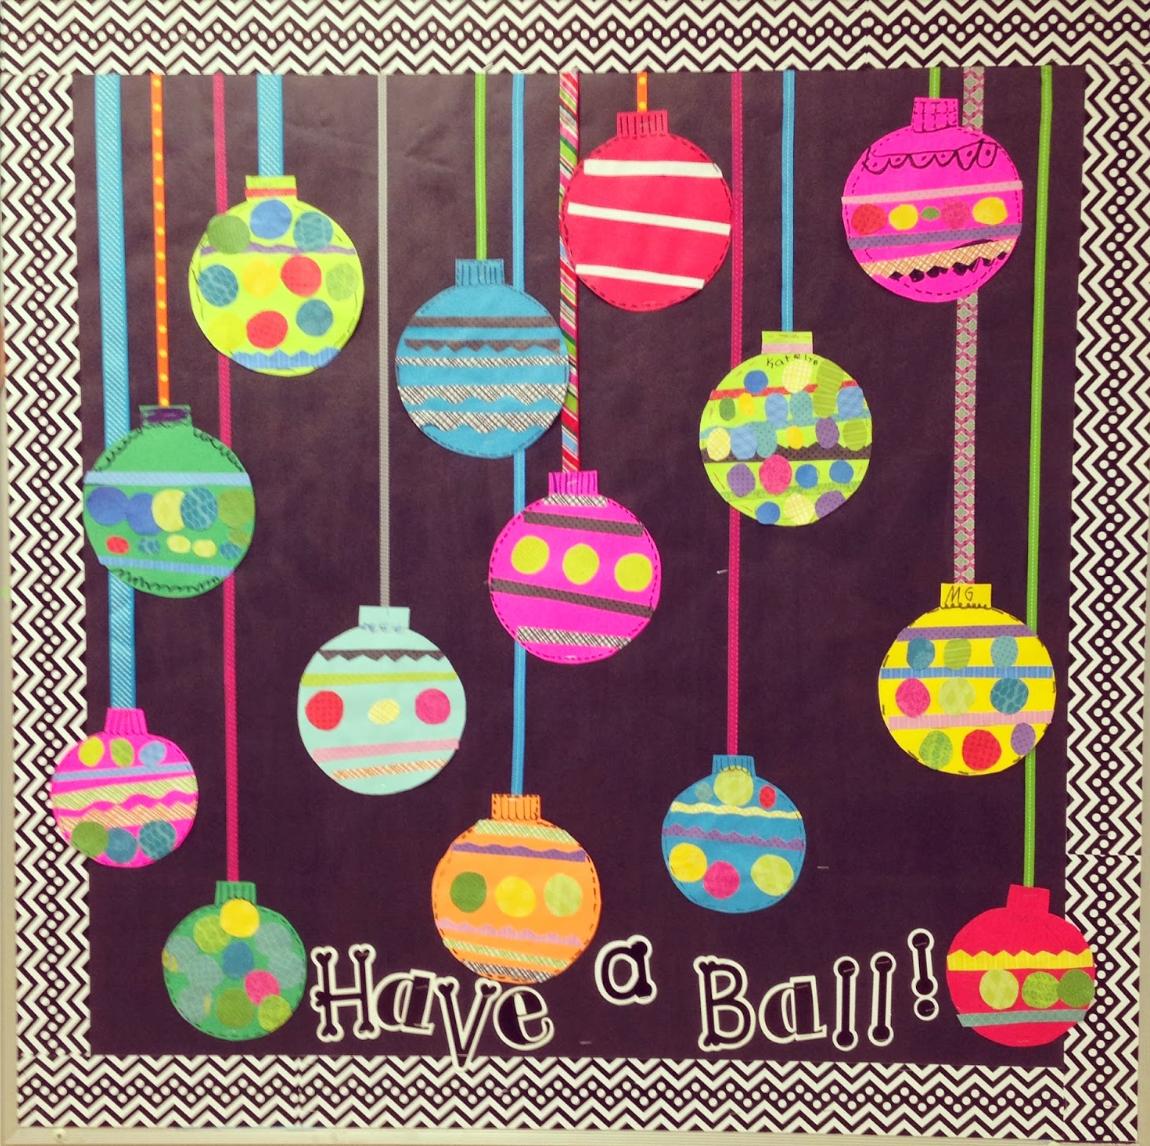 Board Decoration For Christmas: Top December Pinterest Picks